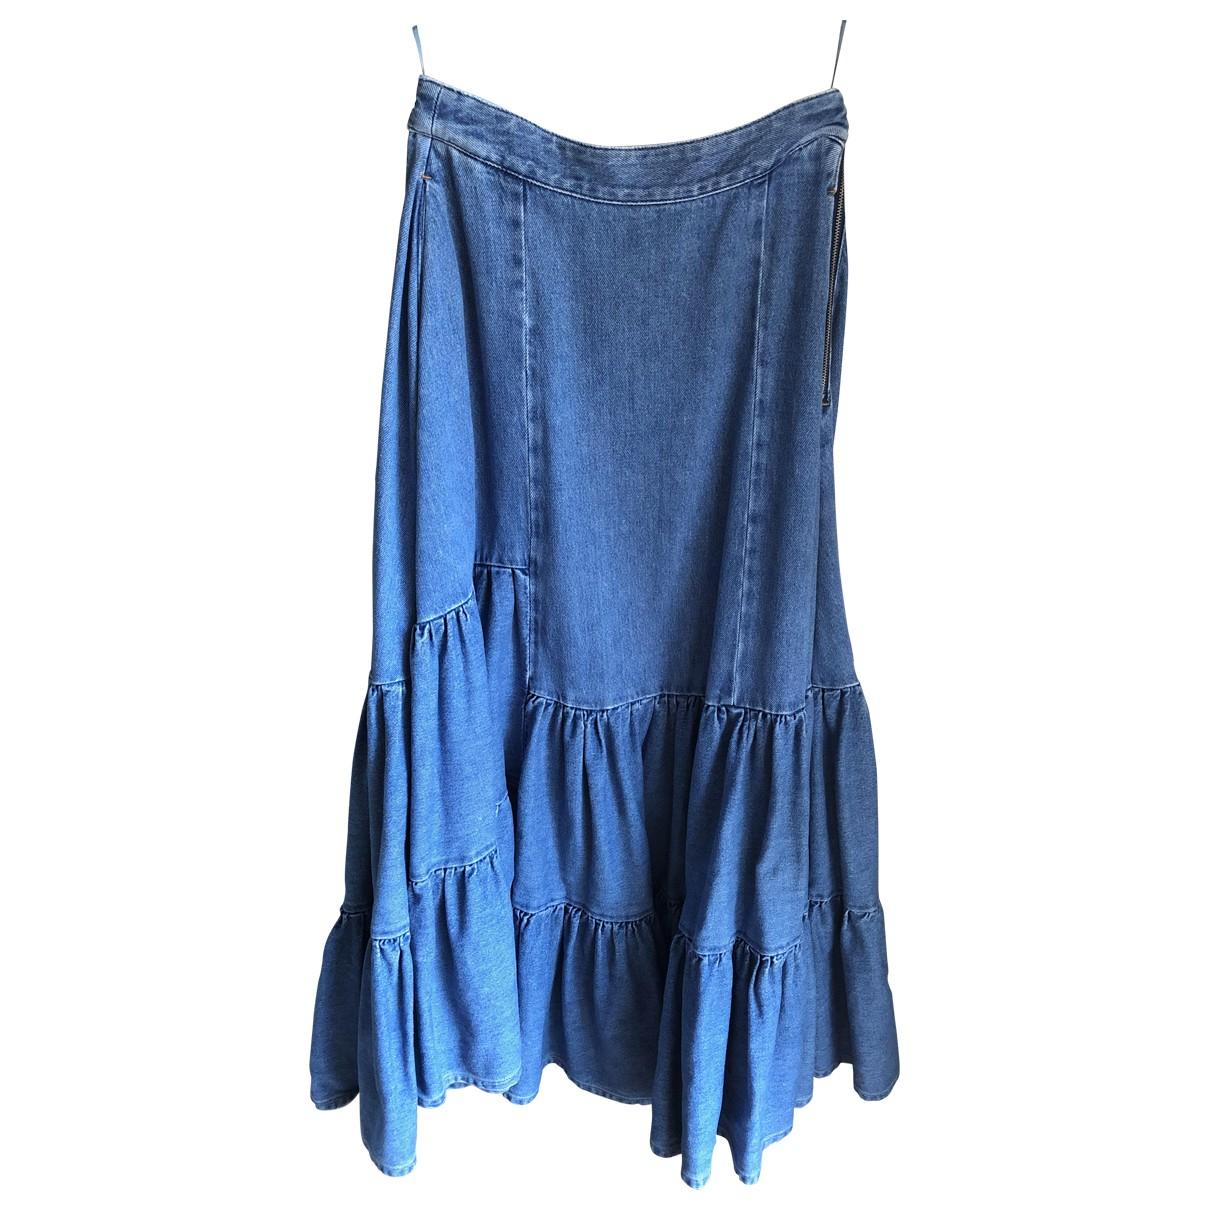 Mm6 \N Rocke in  Blau Denim - Jeans